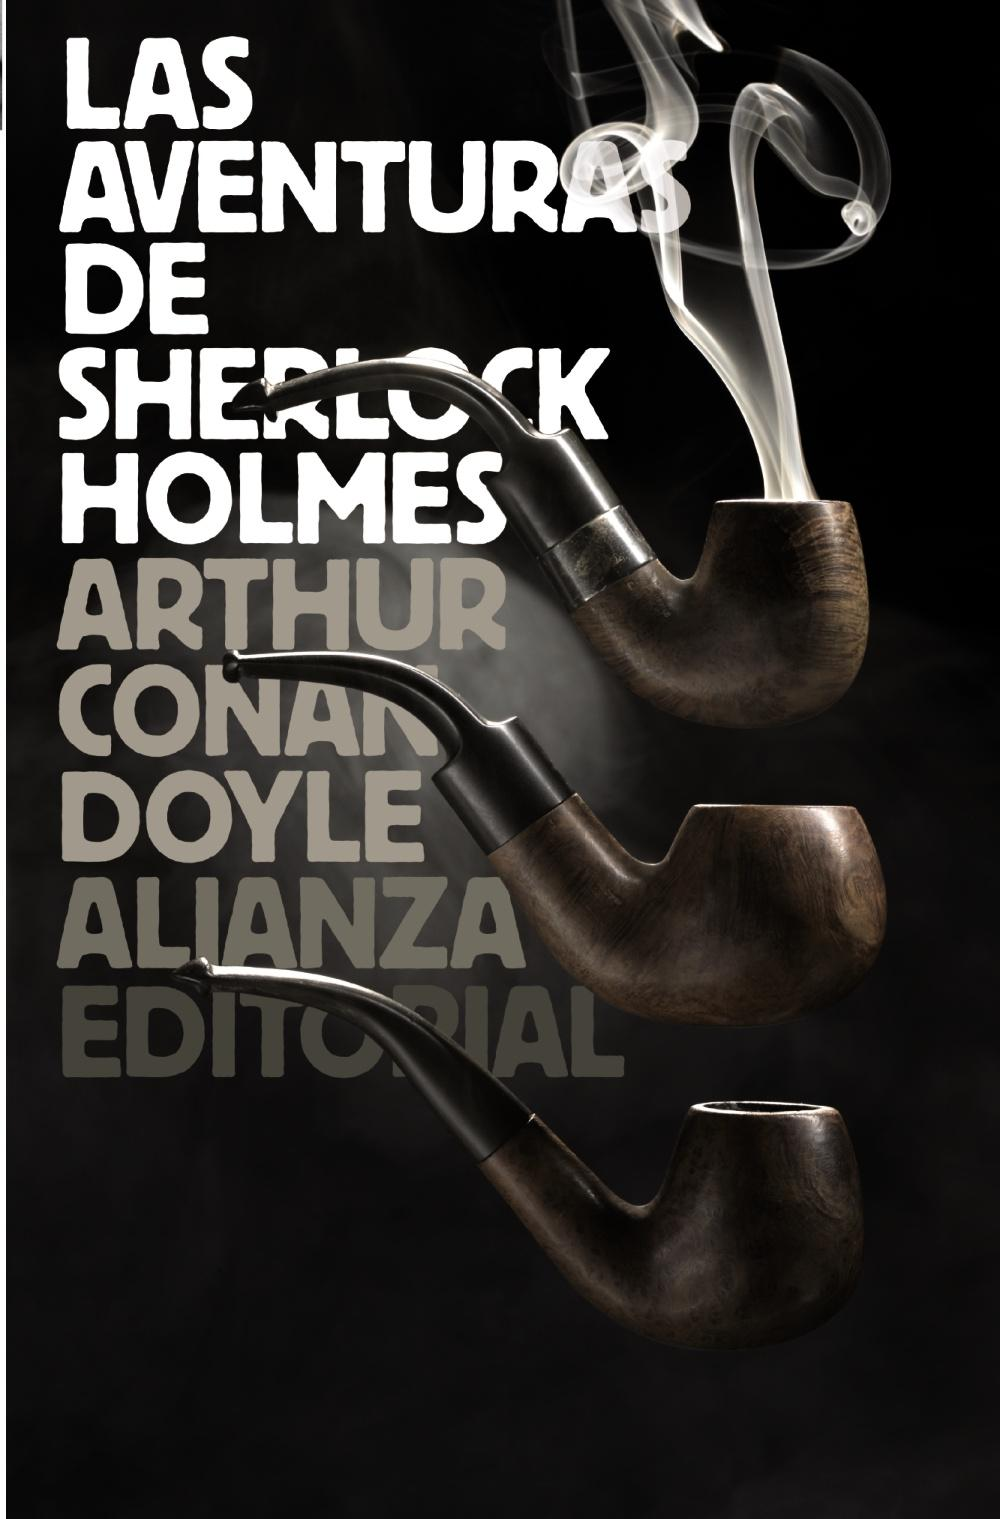 58. The Adventures of Sherlock Holmes